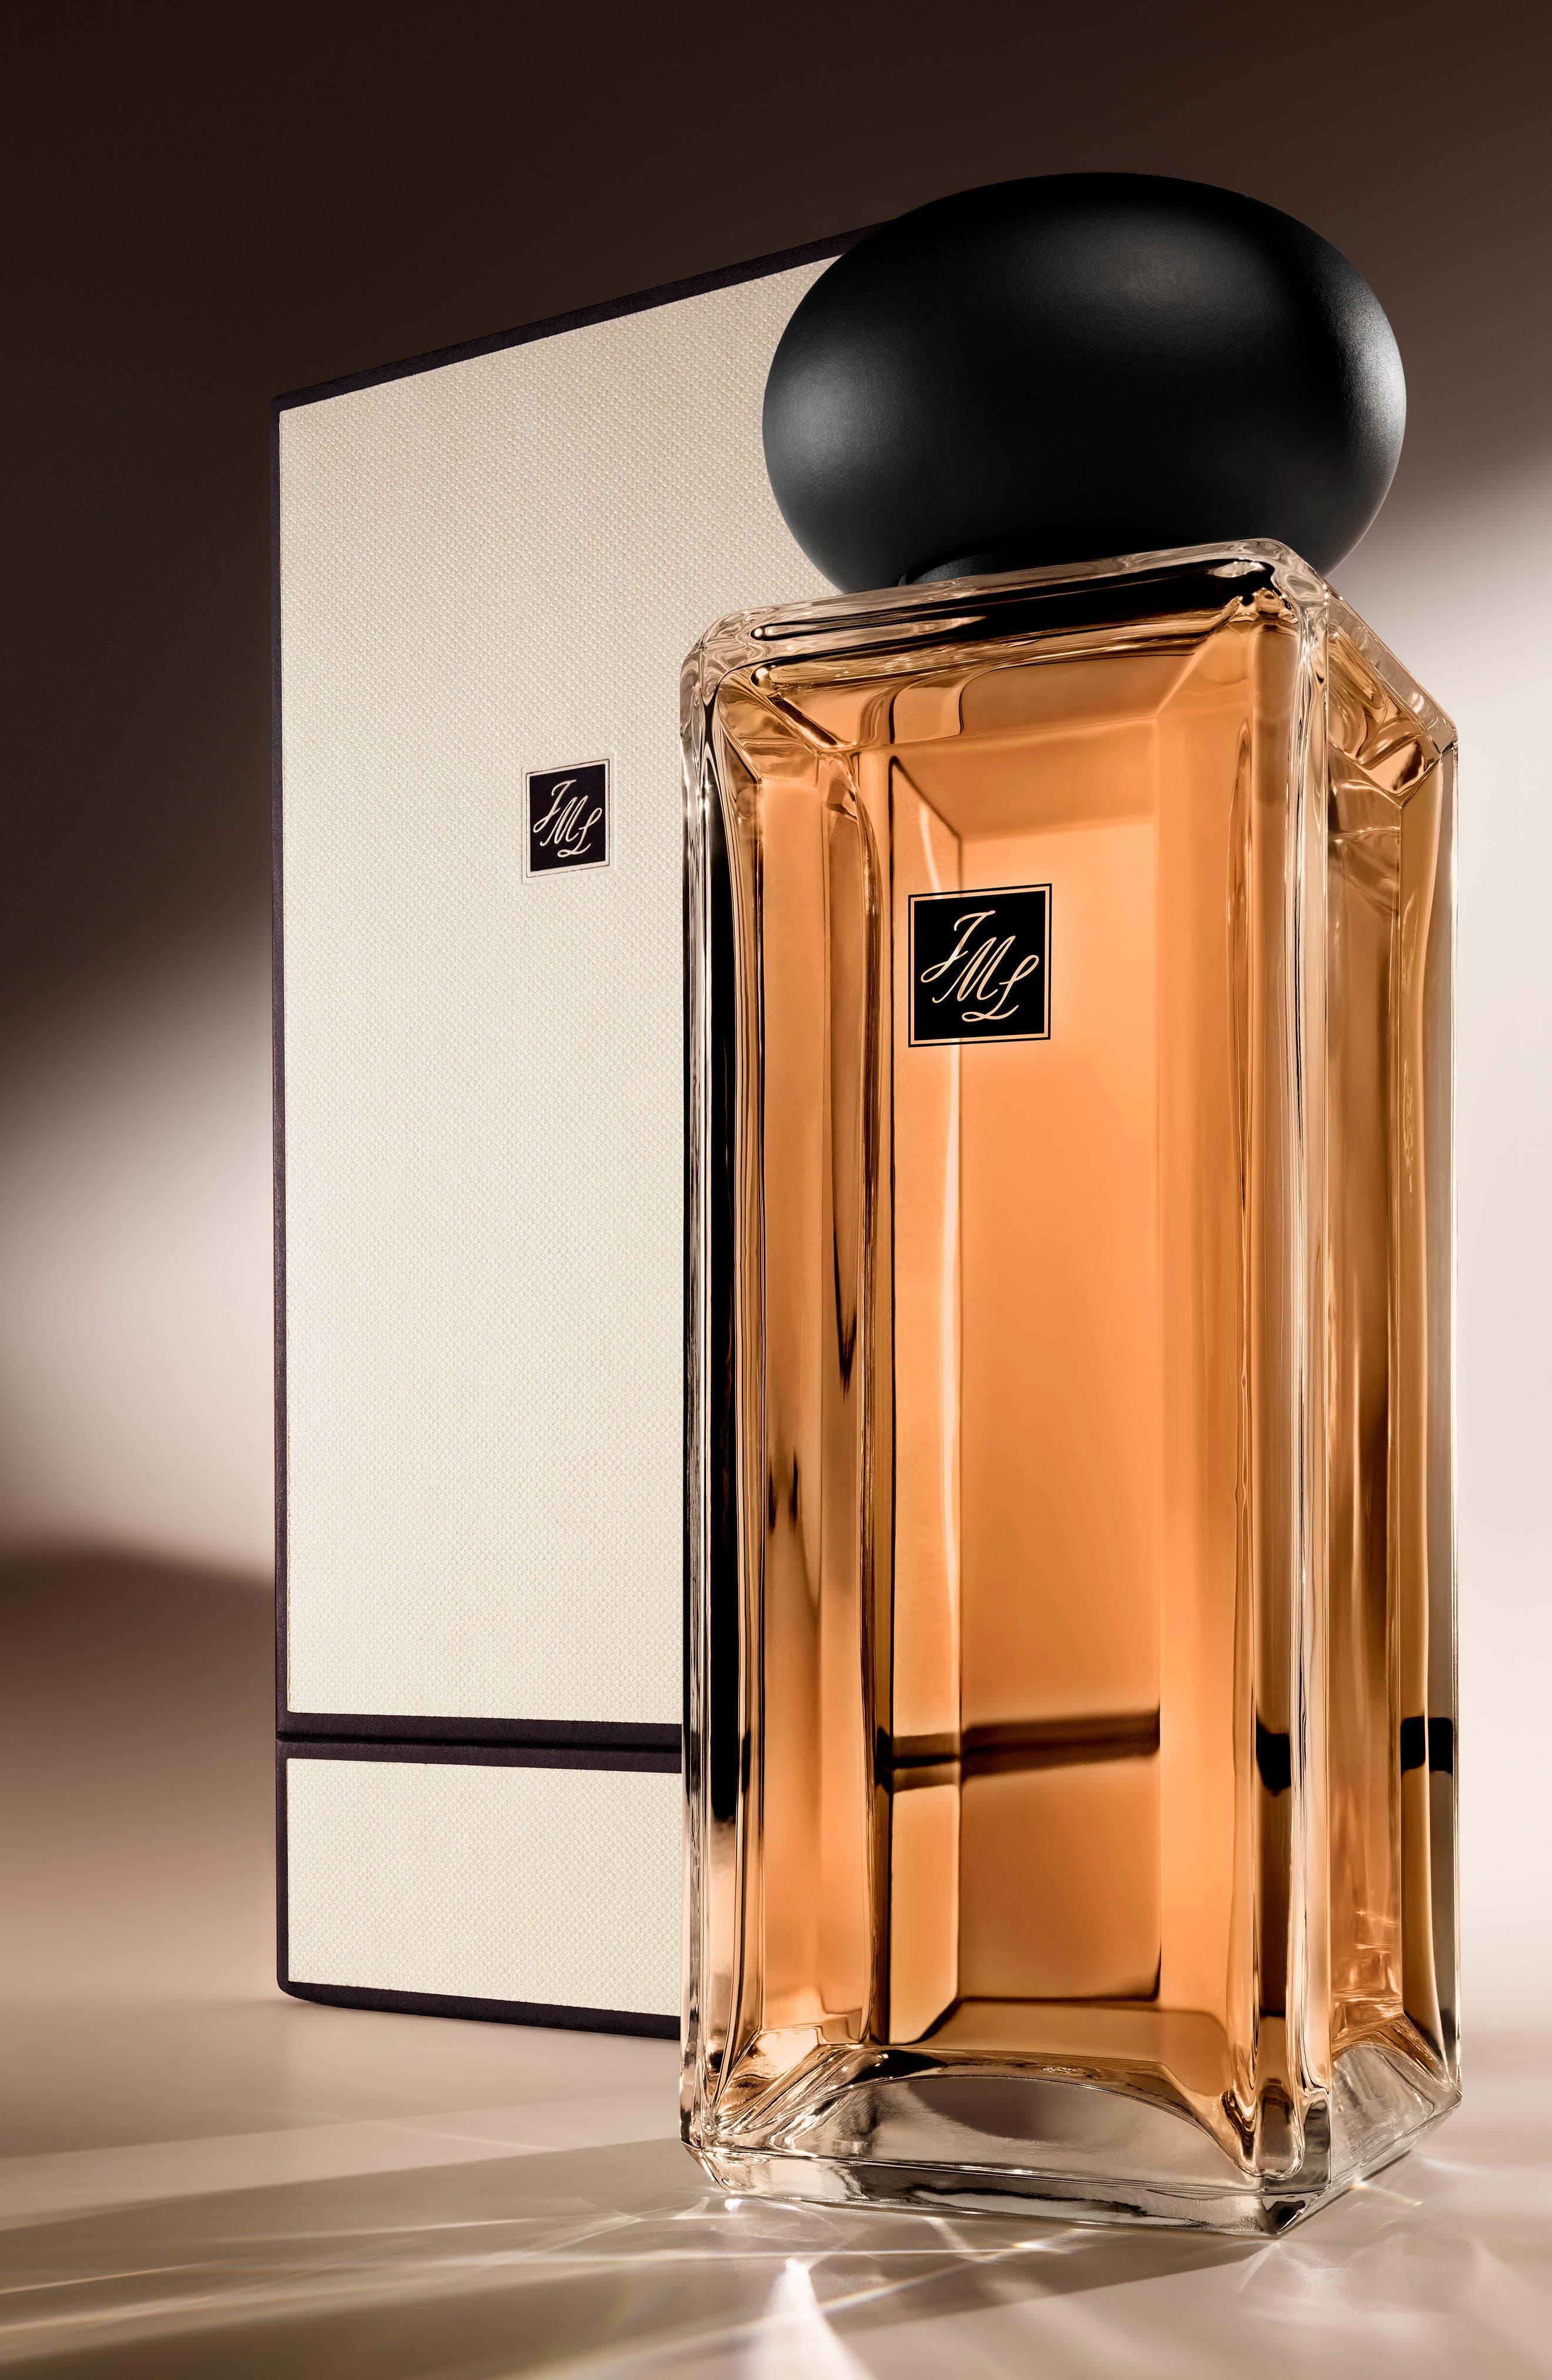 Jo Malone London™ Golden Needle Tea Cologne